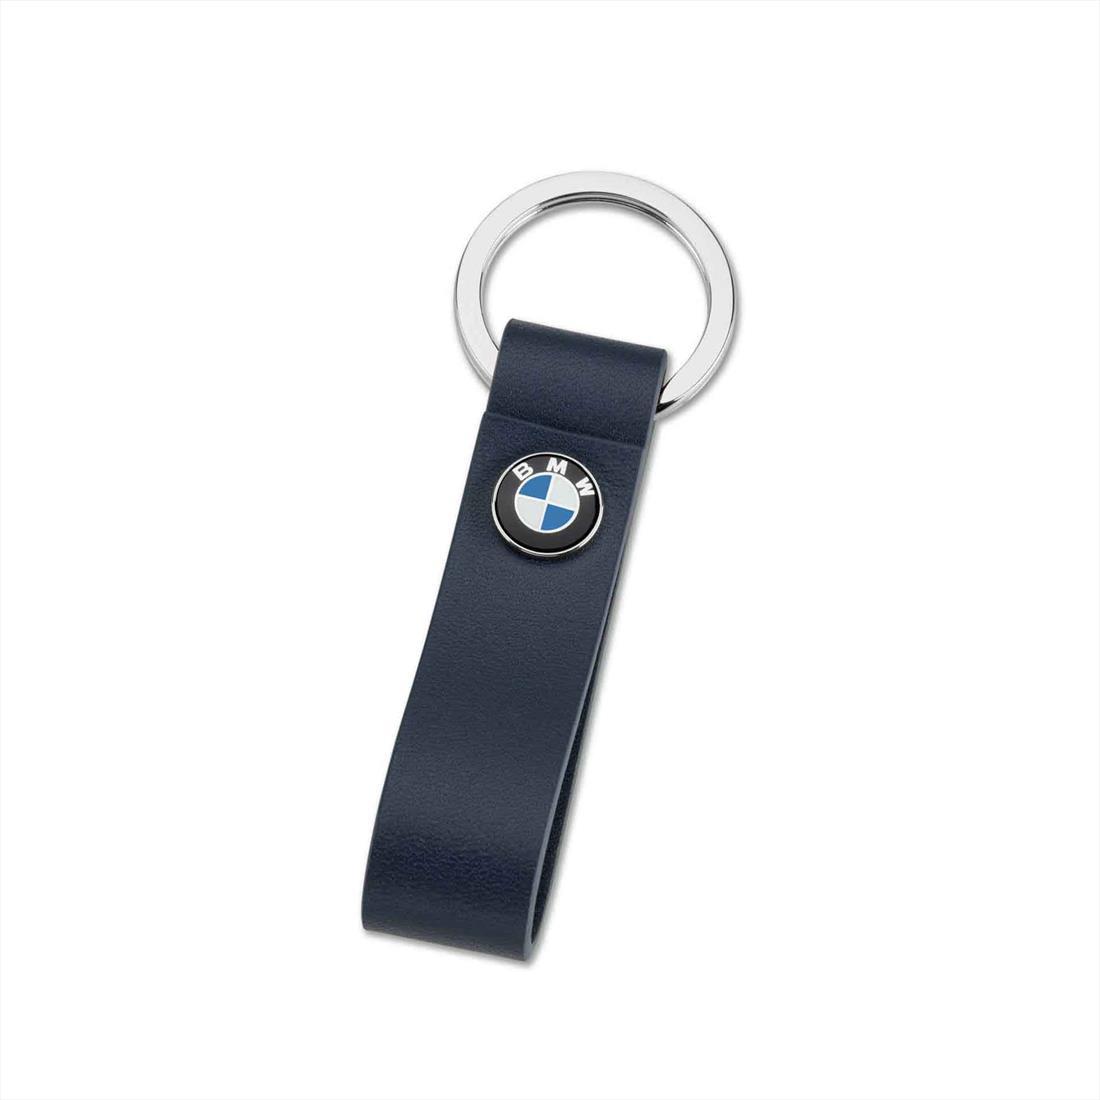 BMW LEATHER LOOP KEY RING